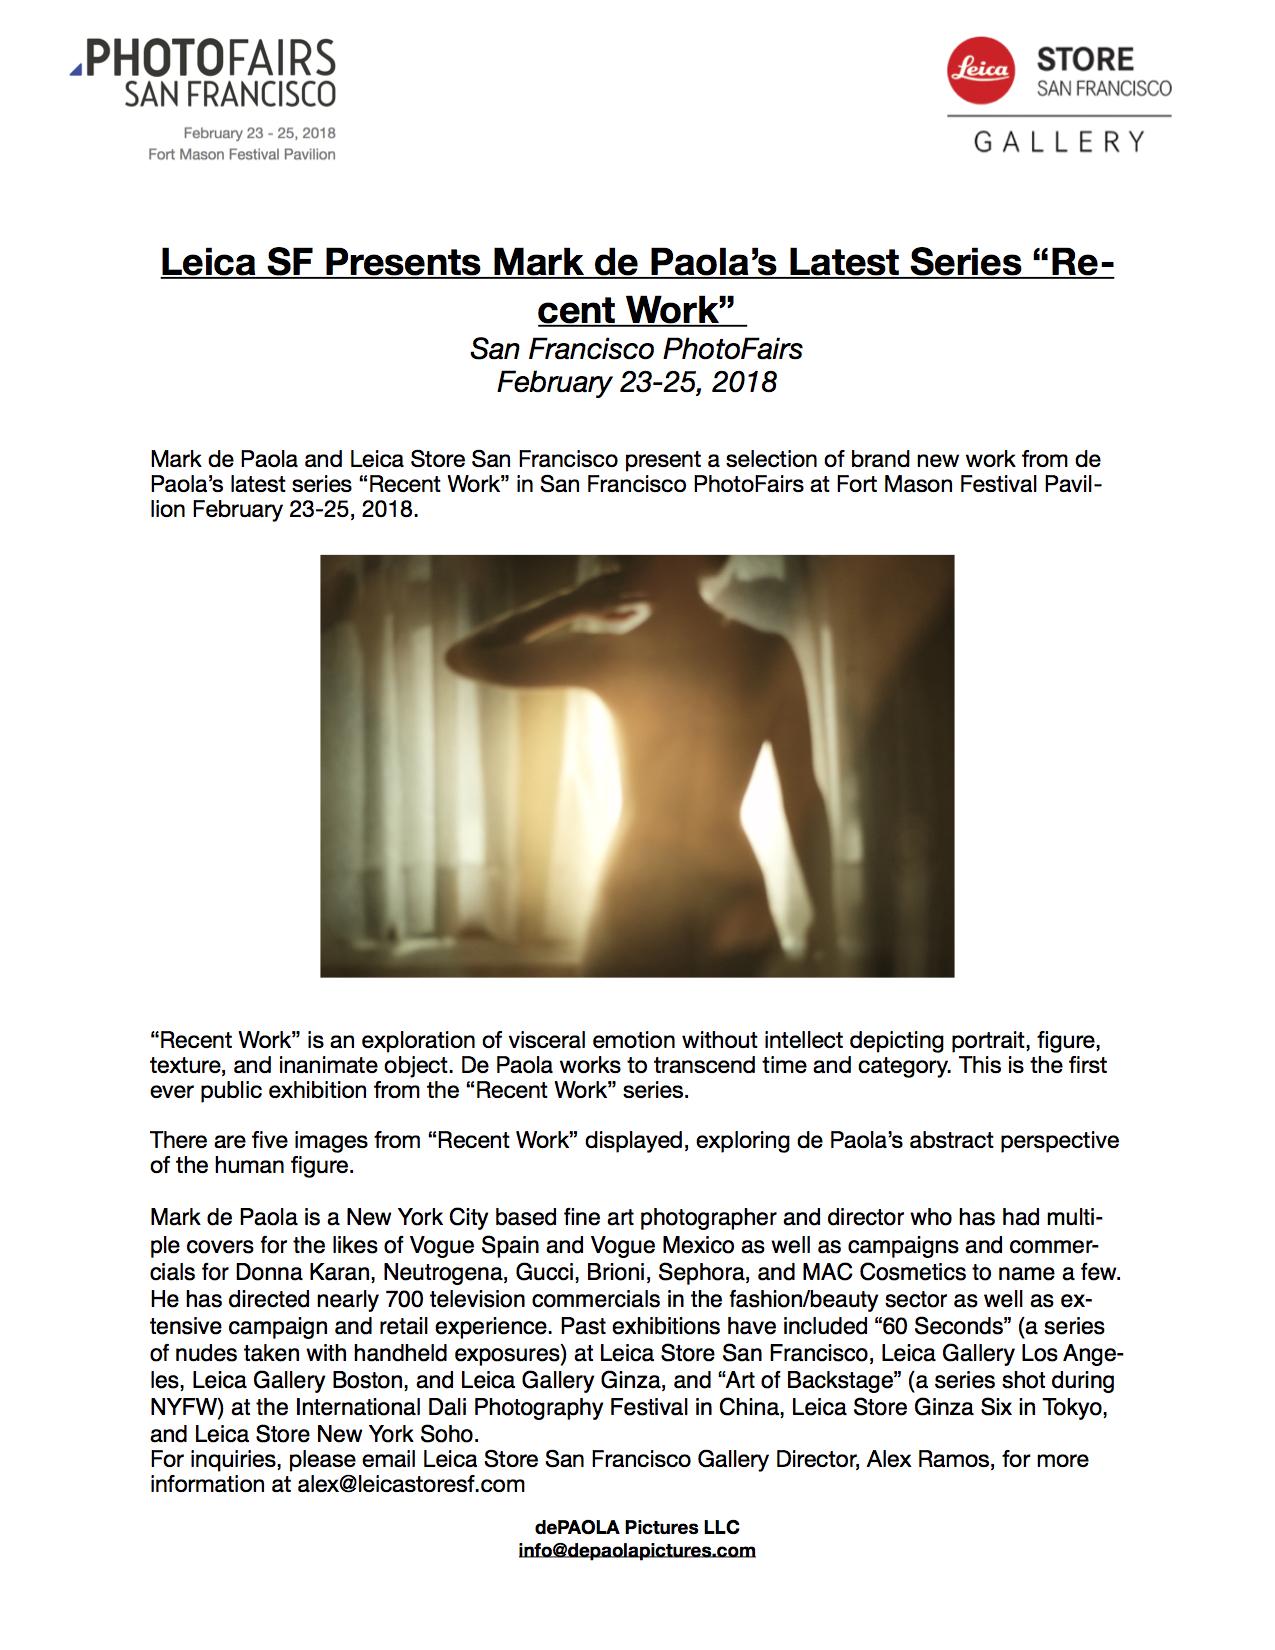 SF PhotoFairs Recent Work Press Release.jpg